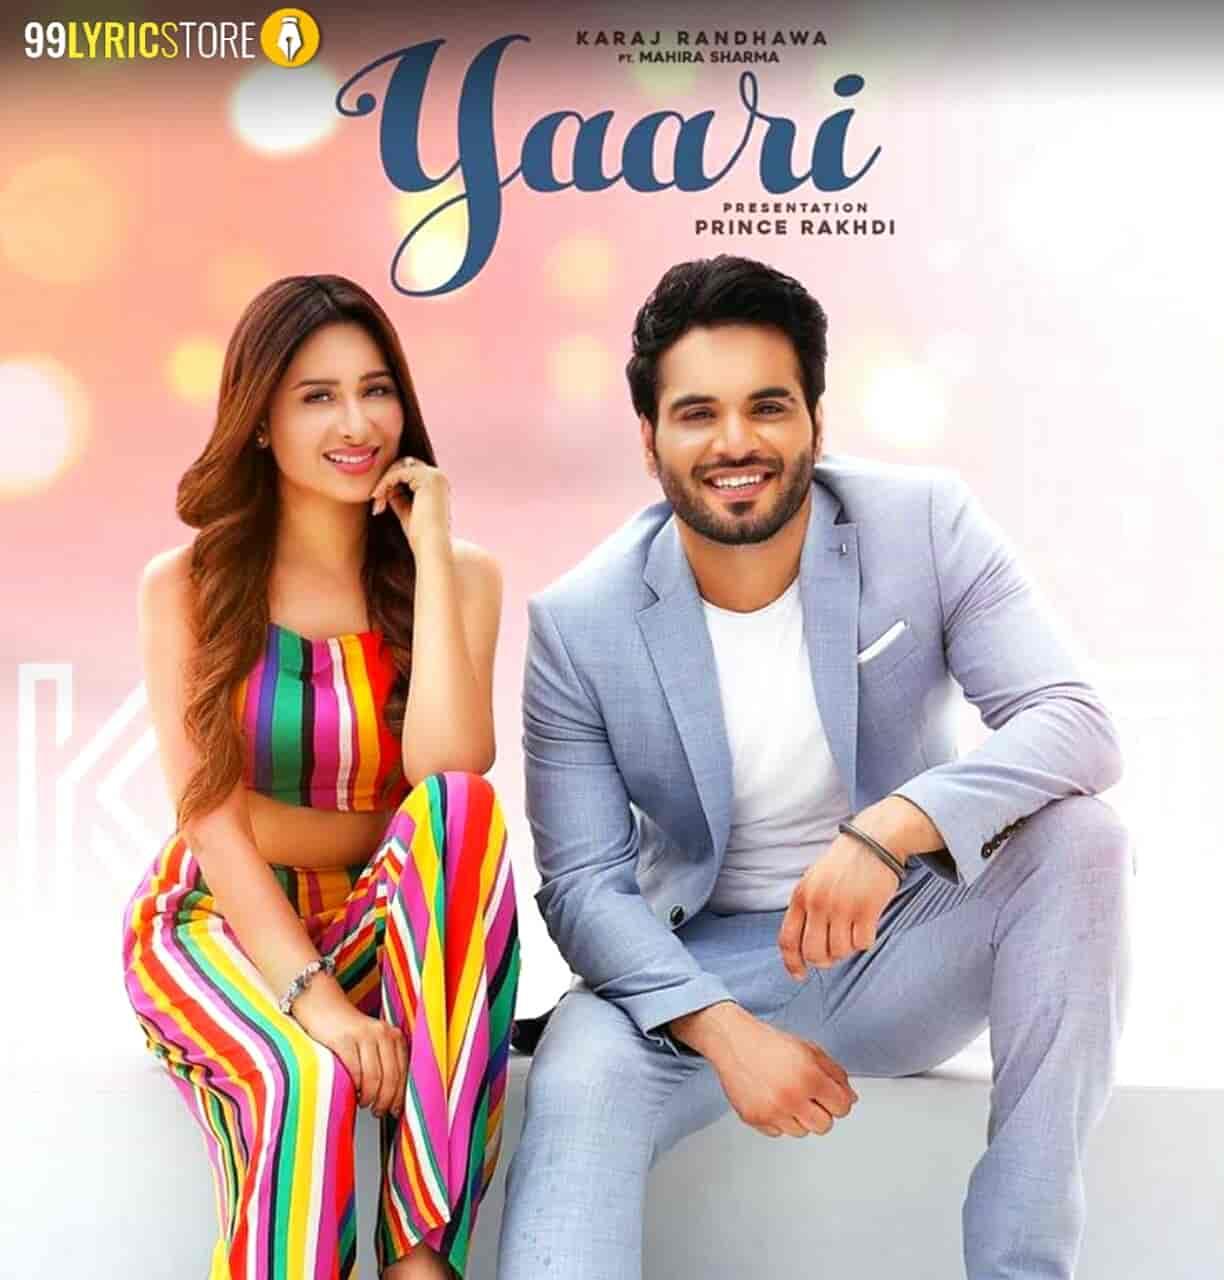 Yaari Punjabi Song Sung by Karaj Randhawa